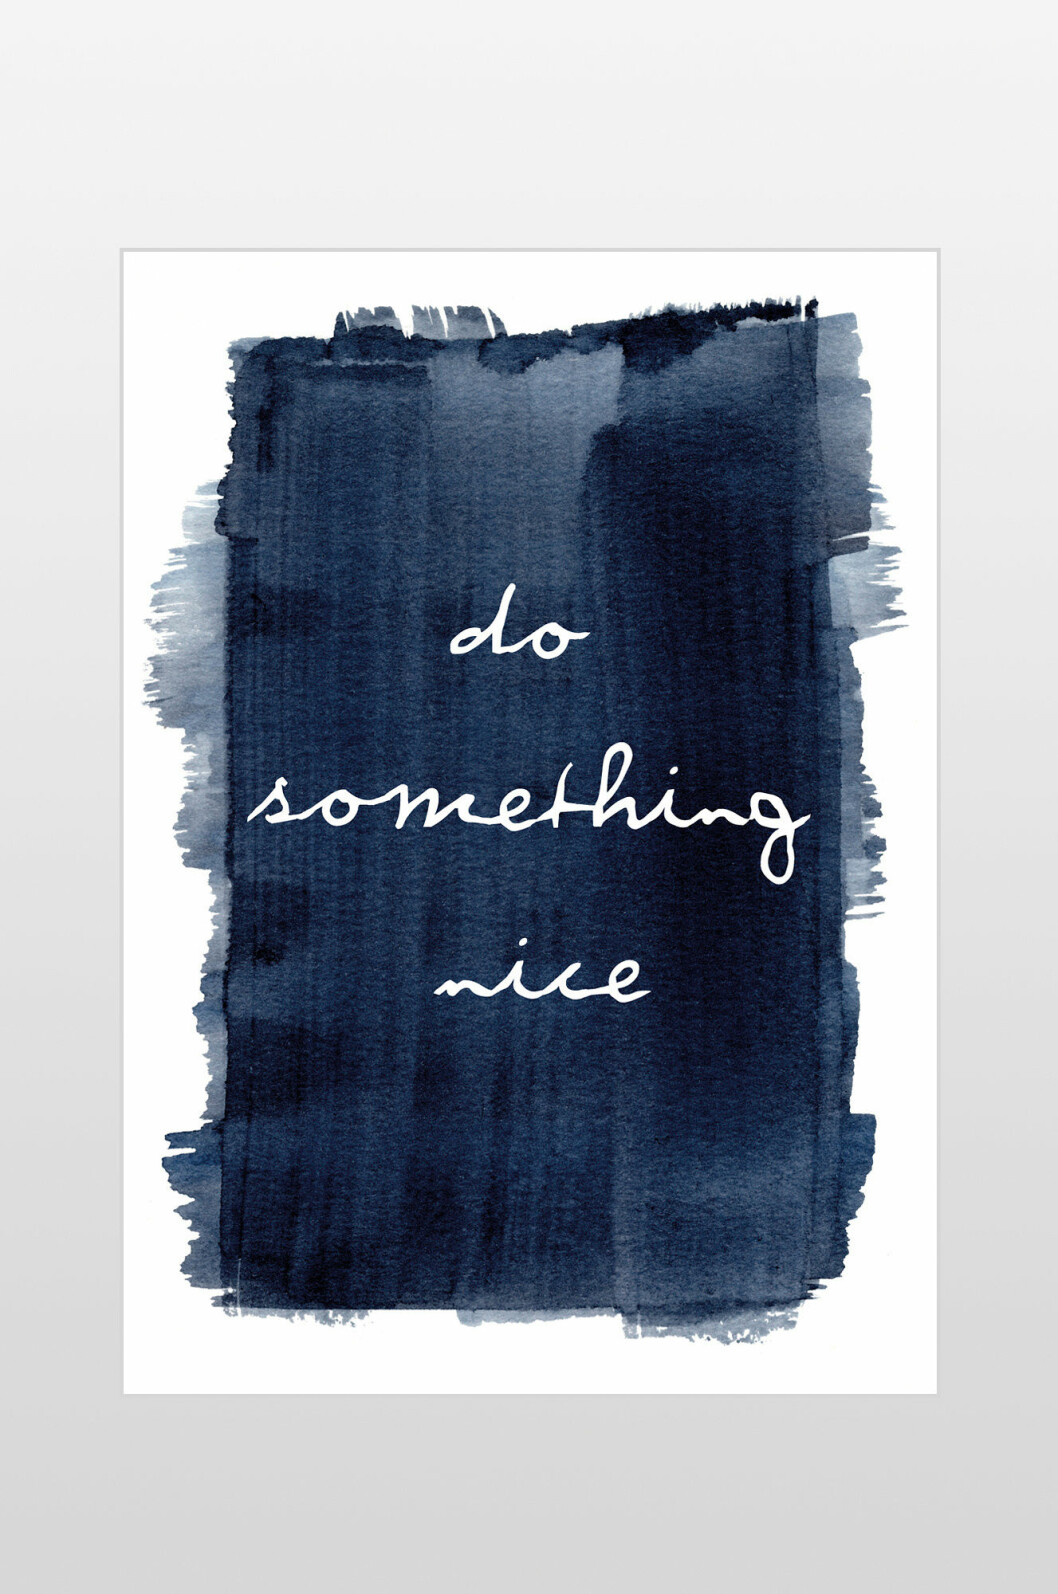 affisch do something nice